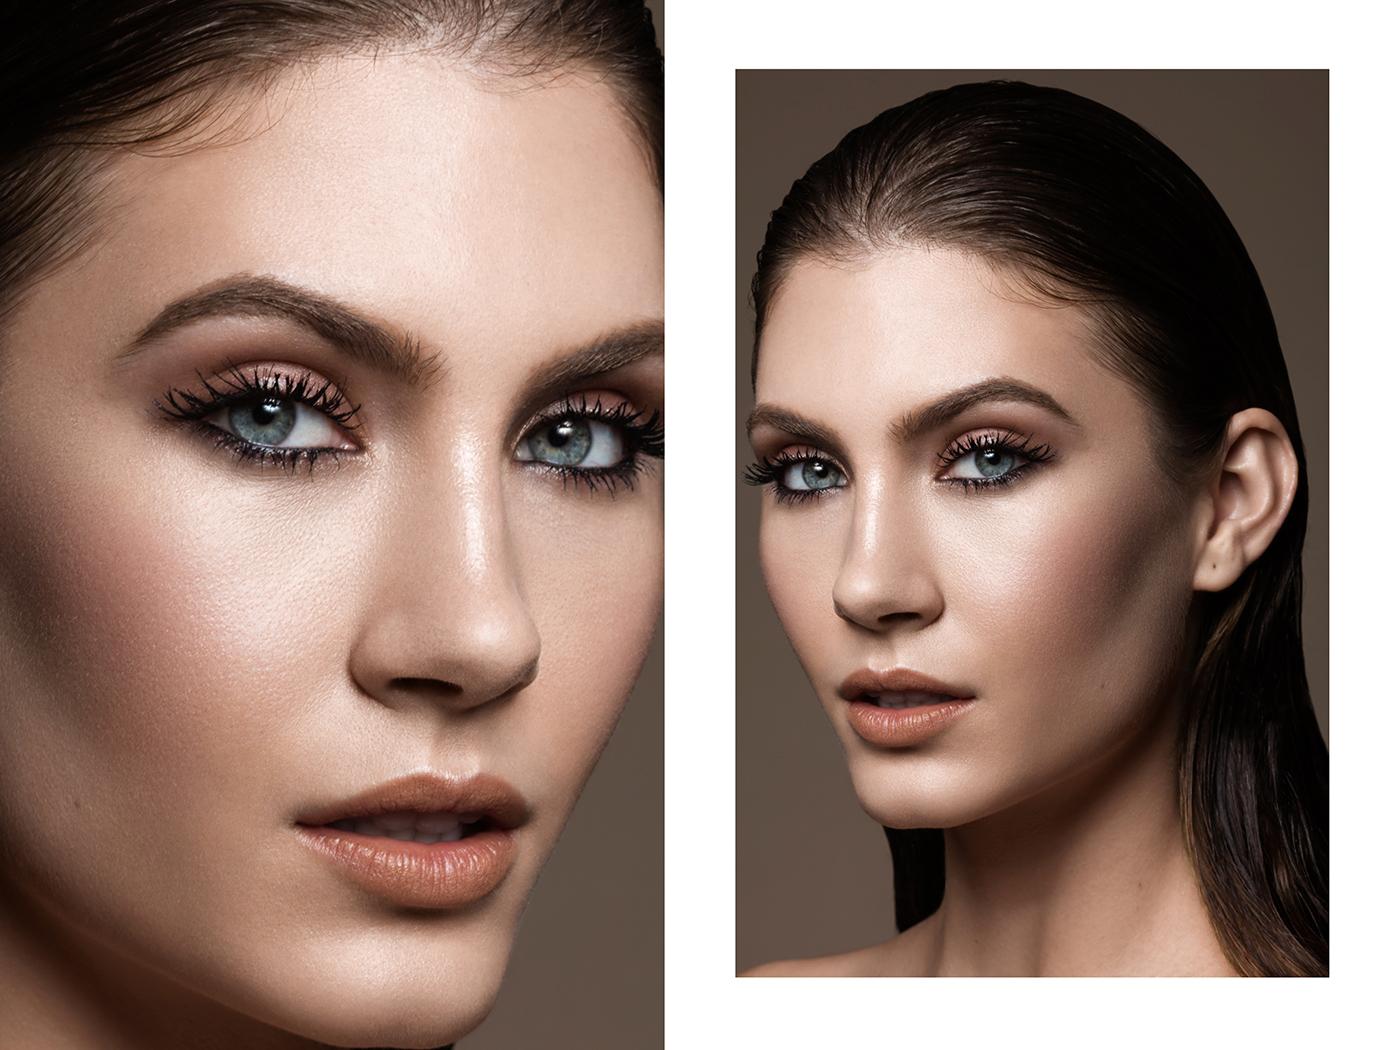 beauty eyes Mouth woman dodge burn post-production tratamento Imagem